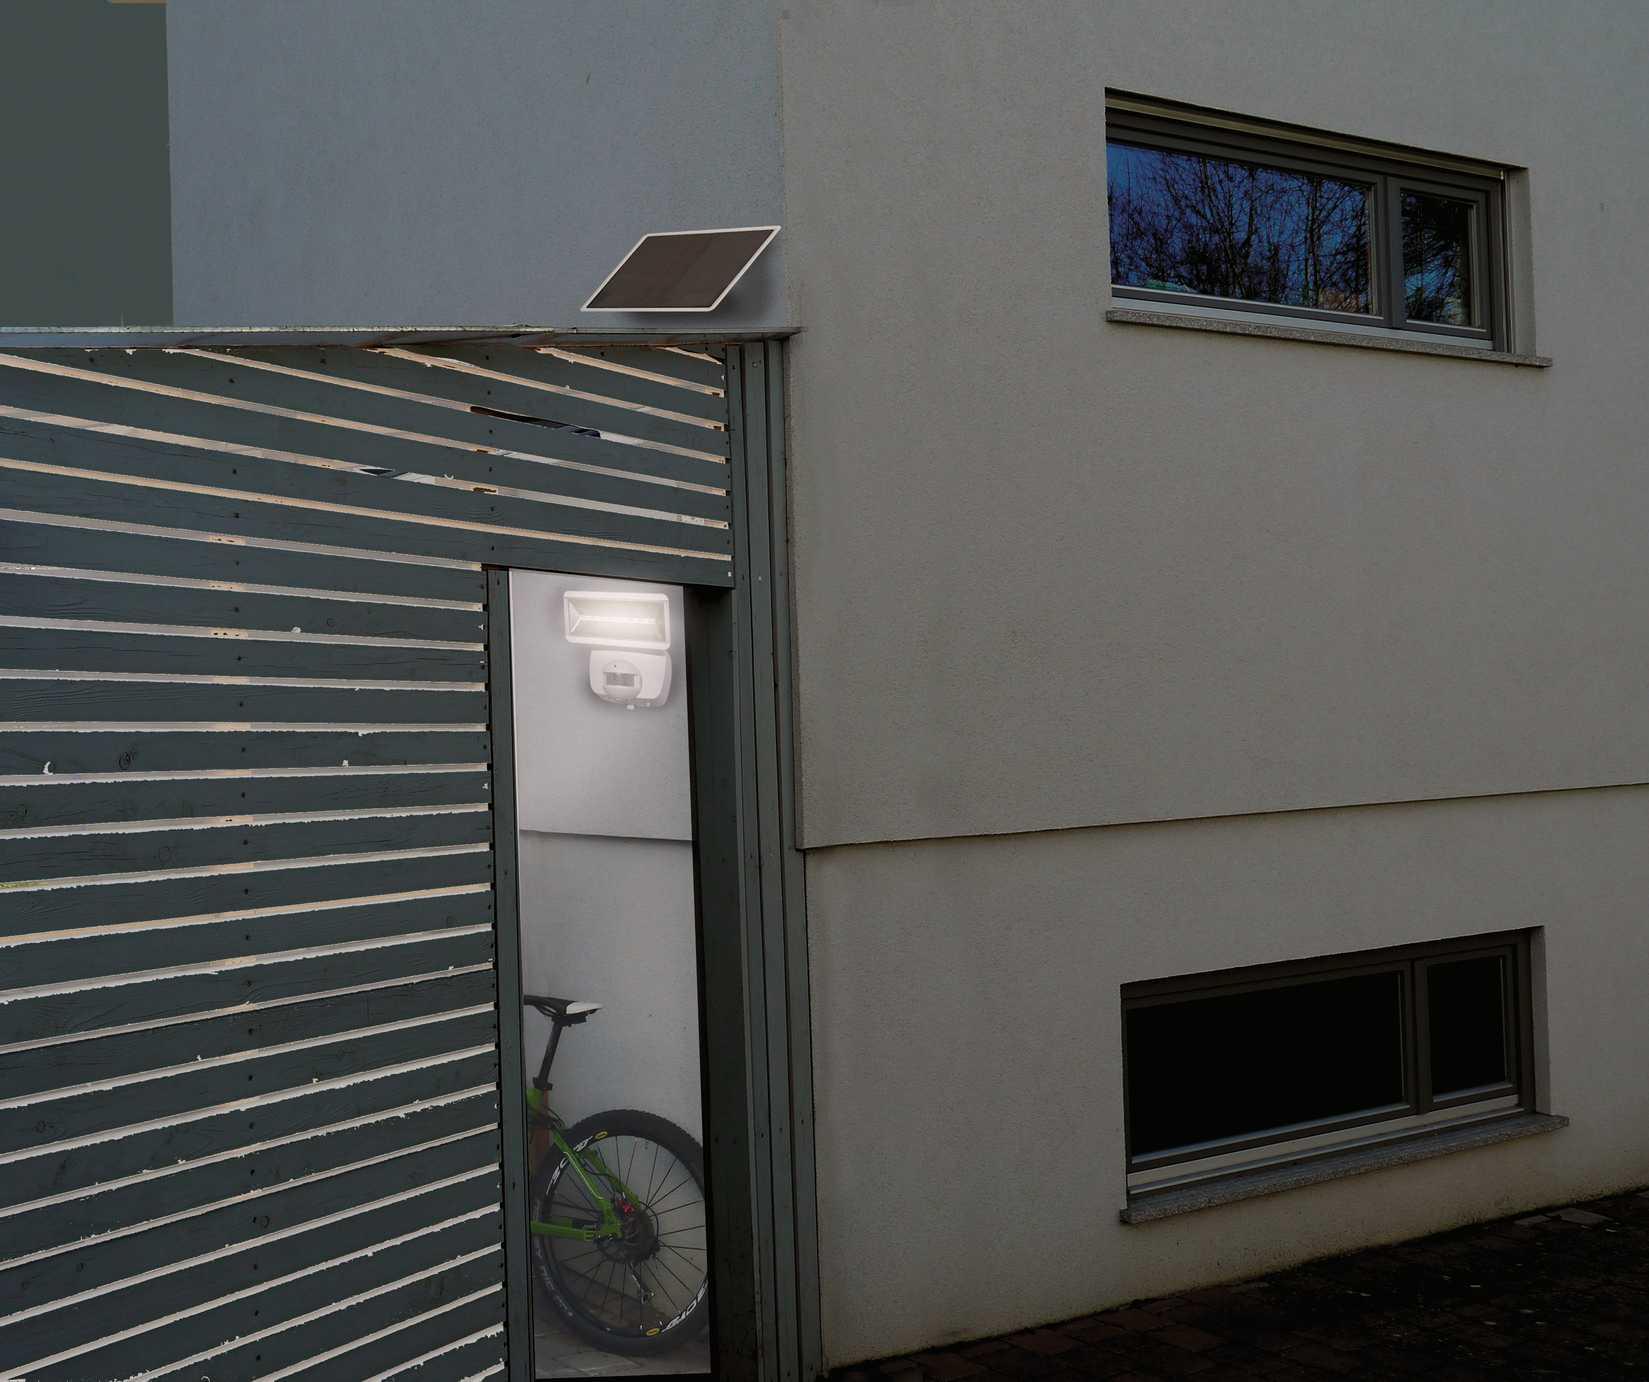 elektro brennenstuhl 1170850010 solar led. Black Bedroom Furniture Sets. Home Design Ideas